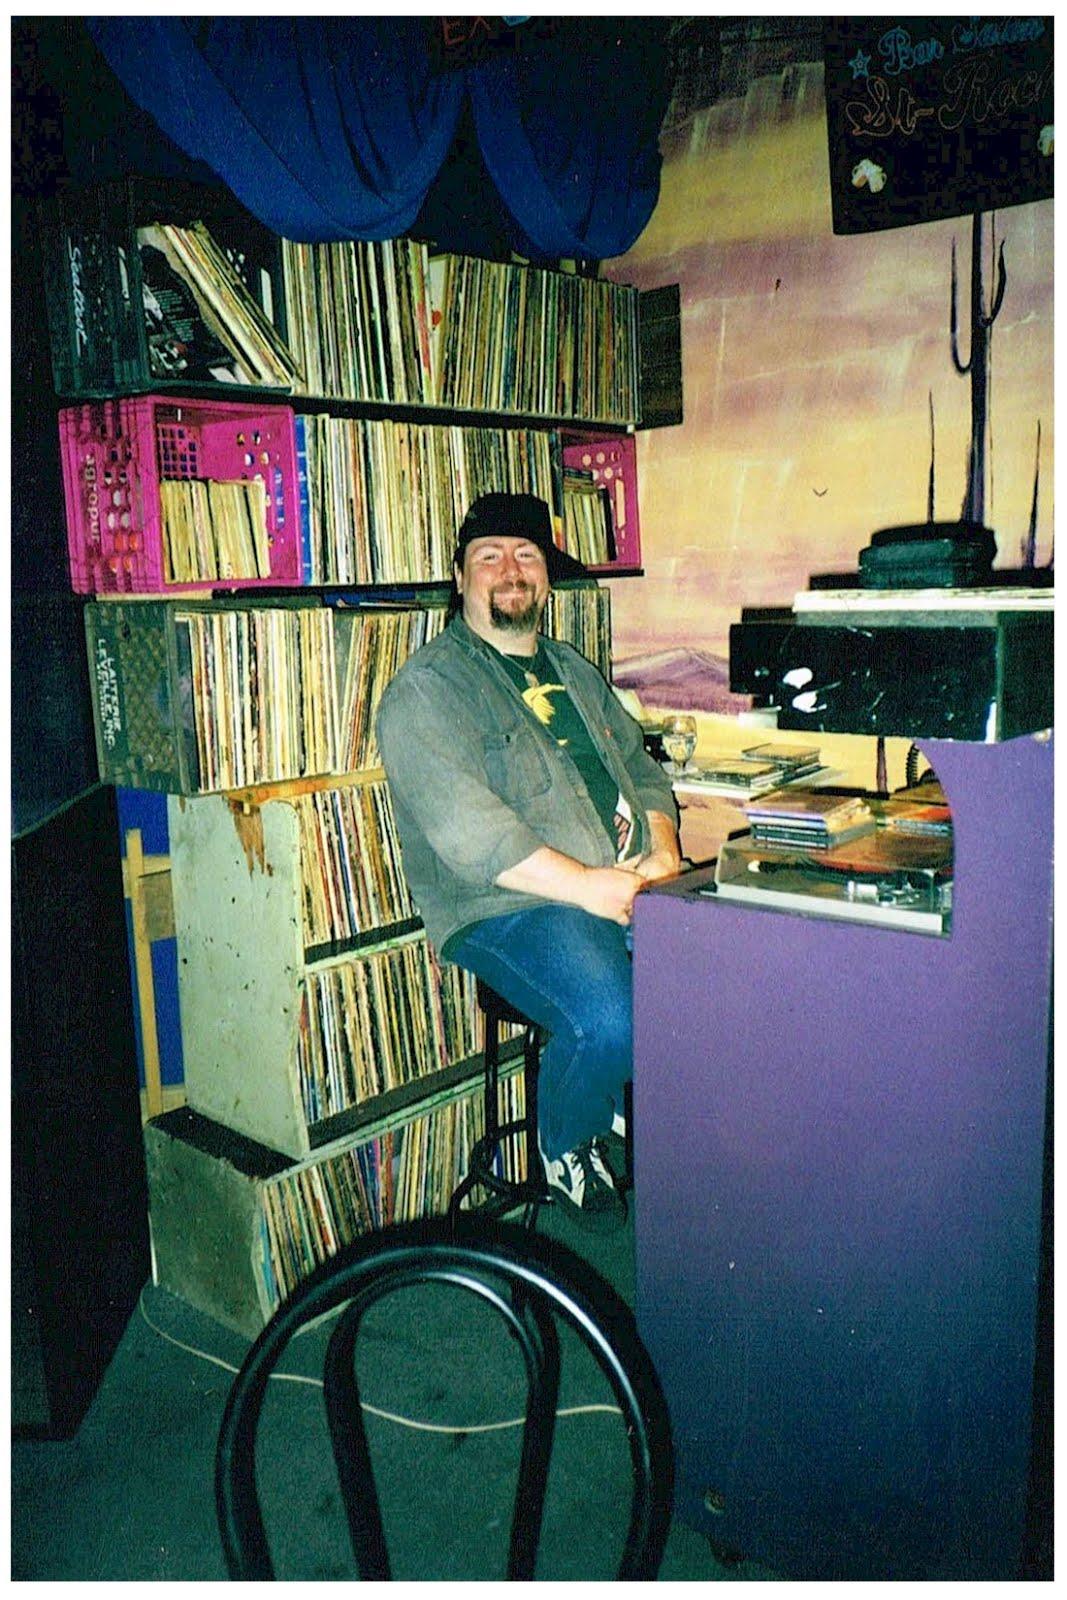 Big John - 1999